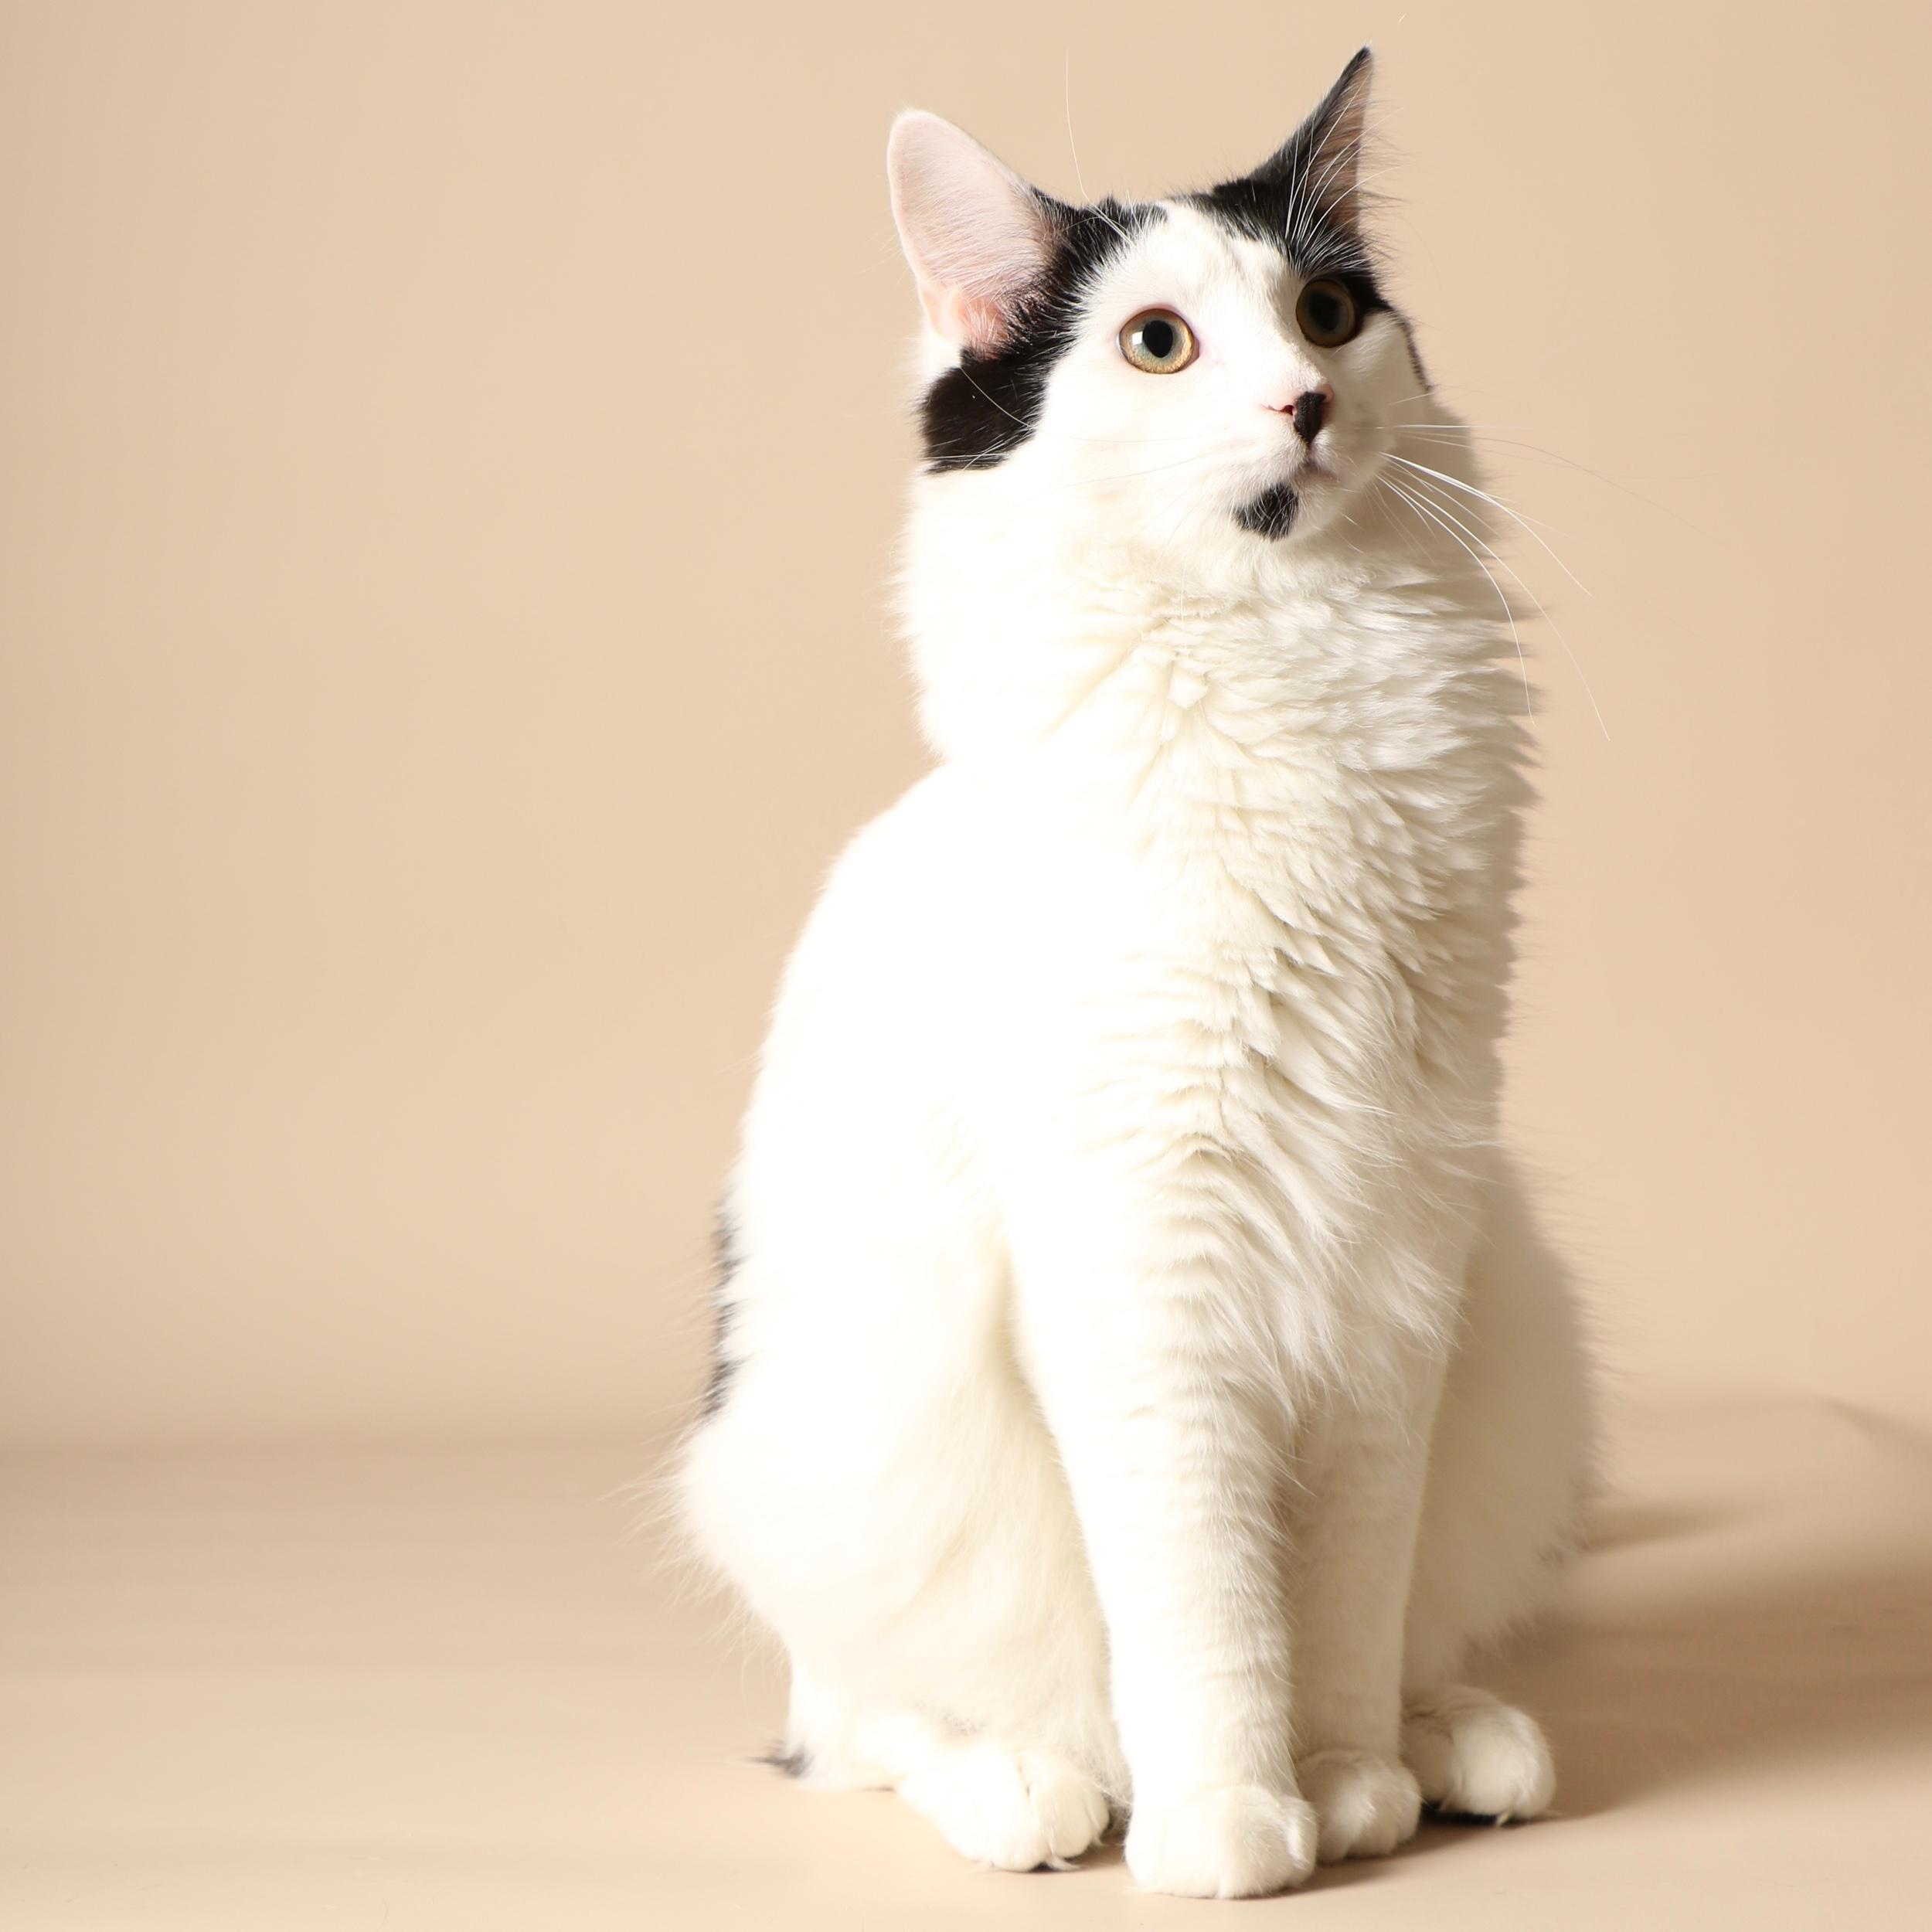 0942cats.jpeg